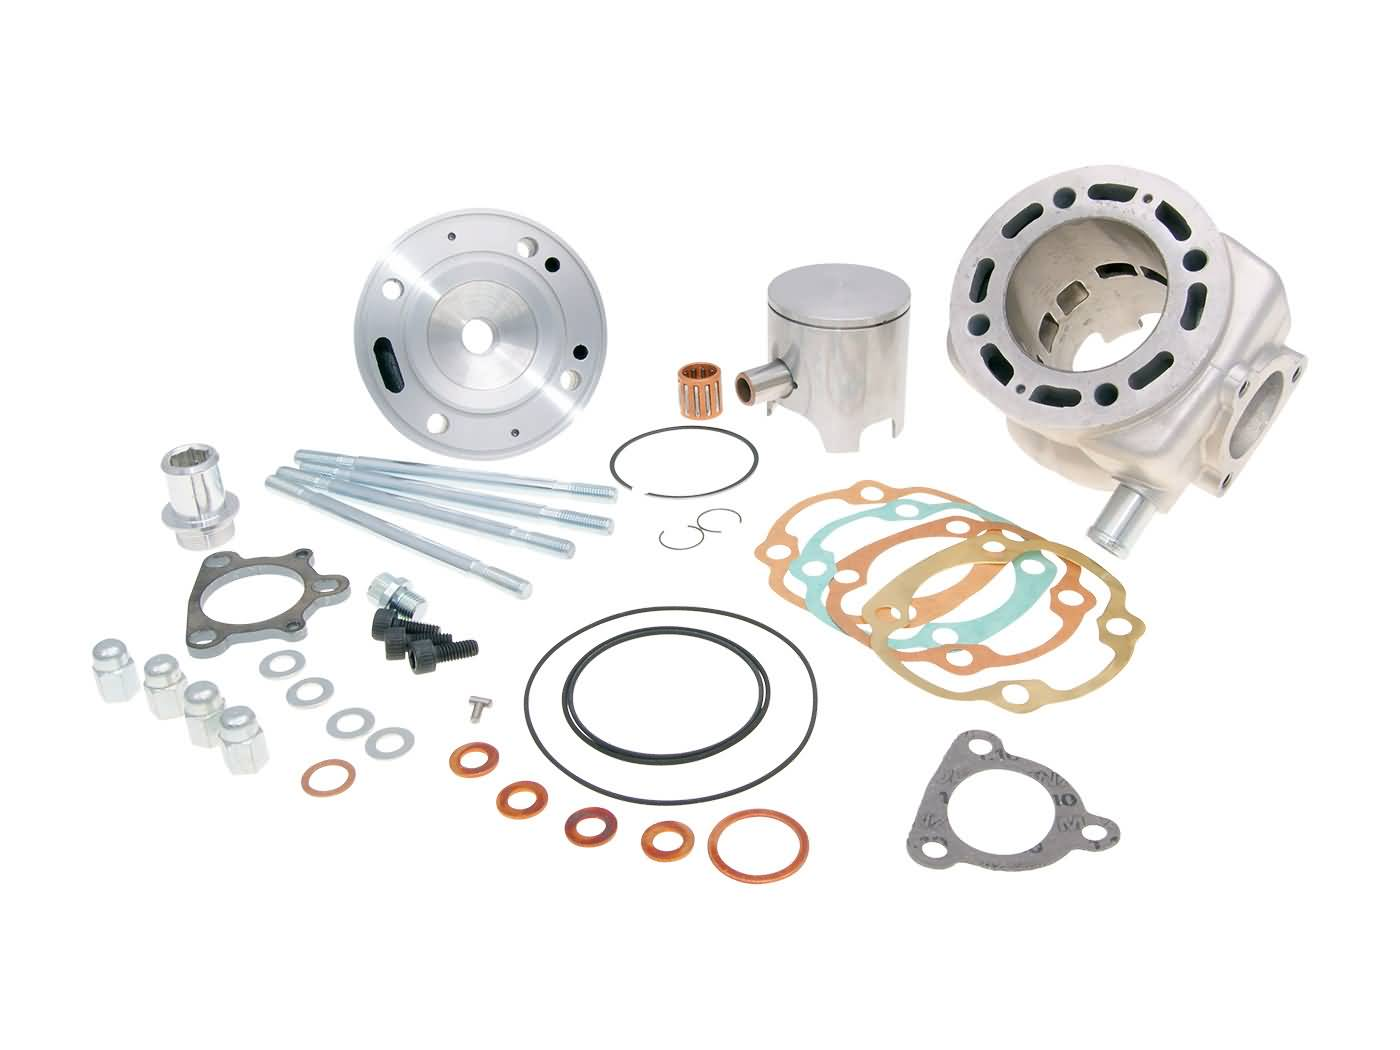 cylinder kit Polini aluminum racing Big Evolution 94cc 52mm